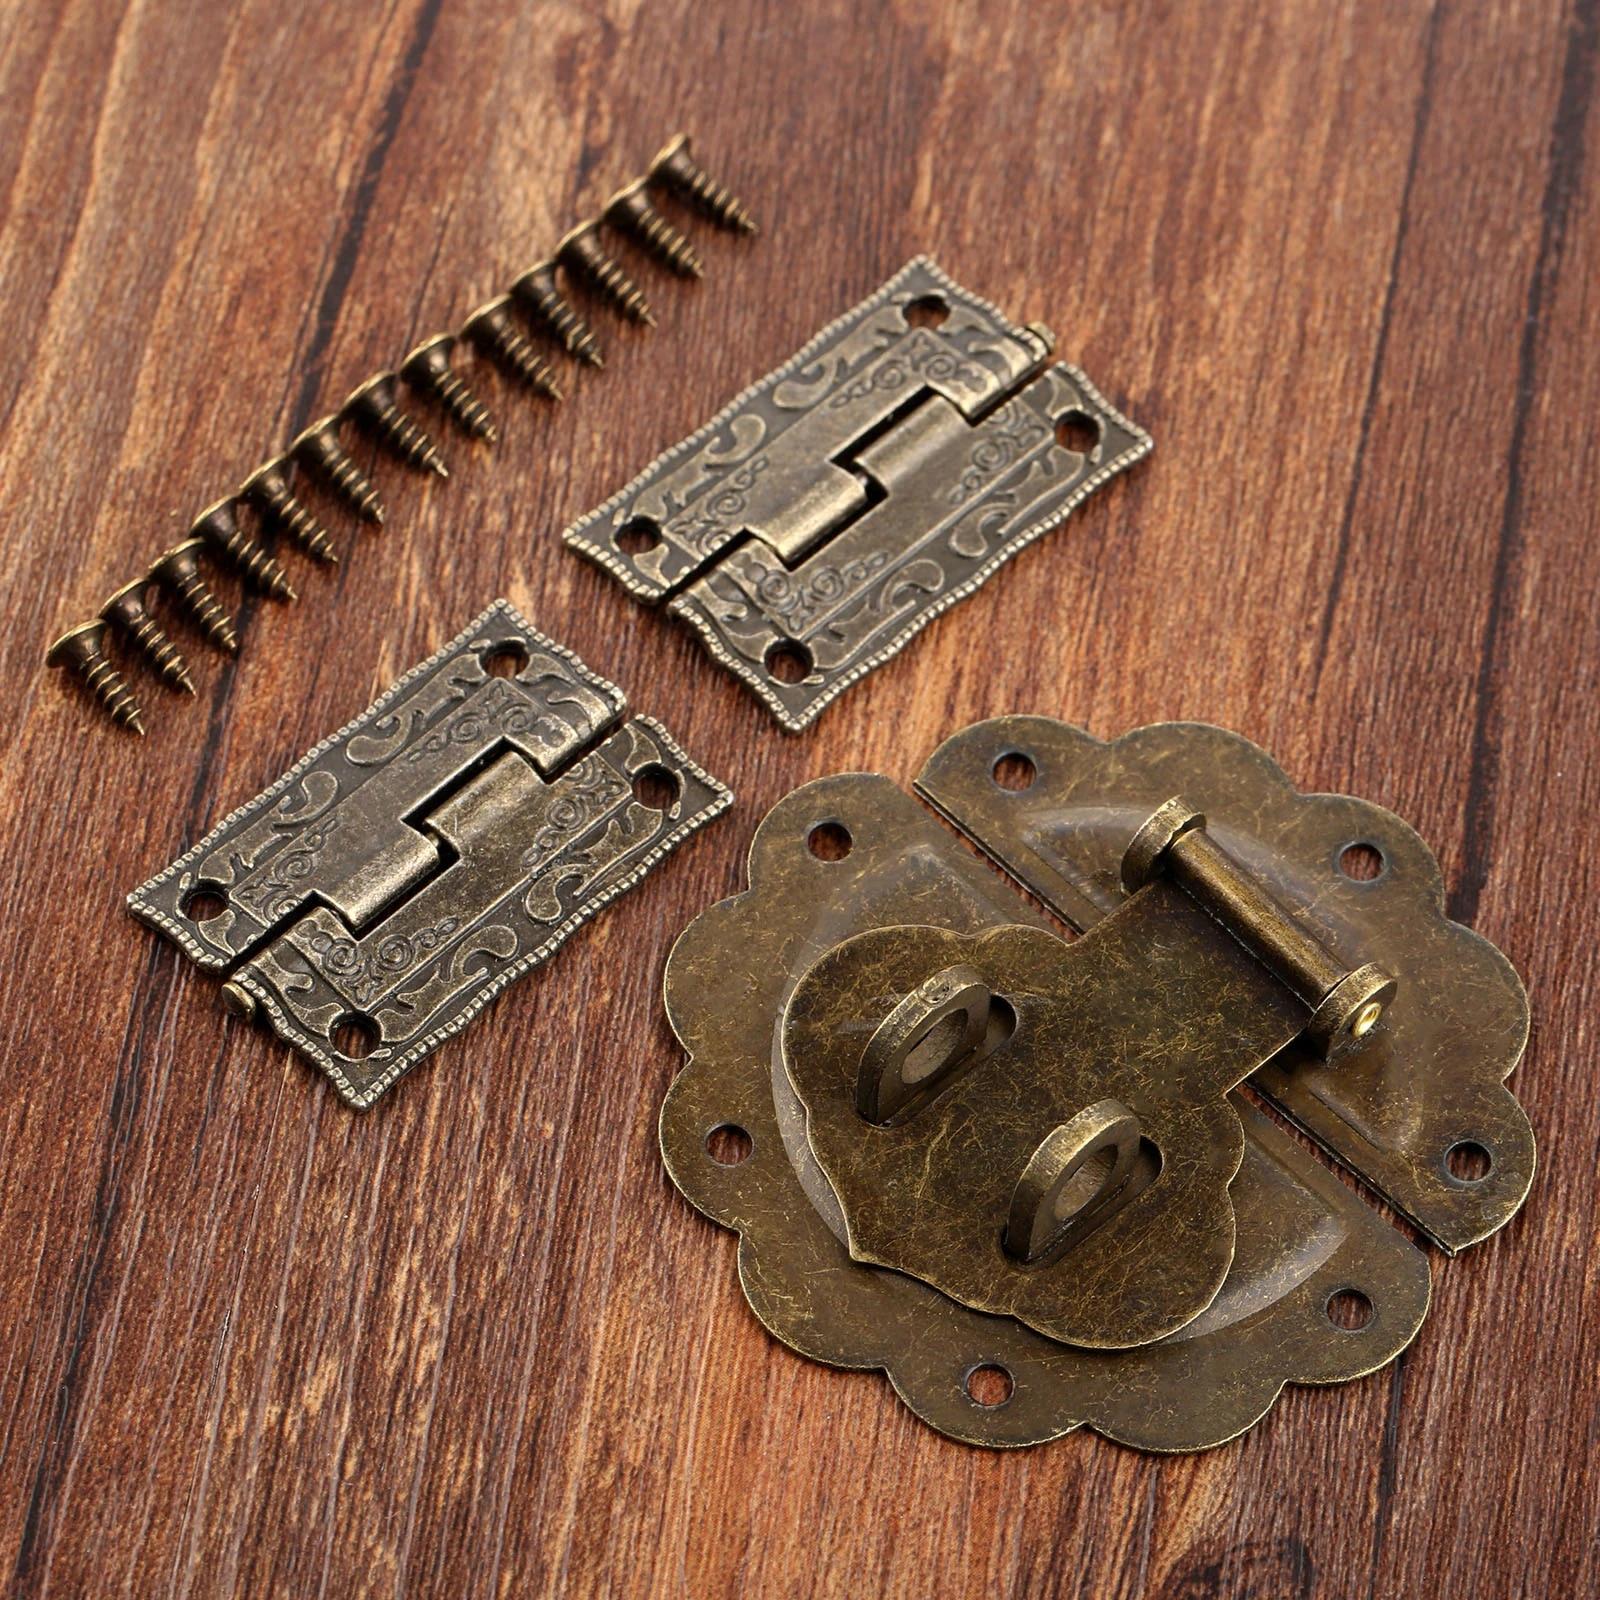 Vintage Latch Catch Hasp Chinese Lock Jewelry Box Chest Case Decorative 1 Set